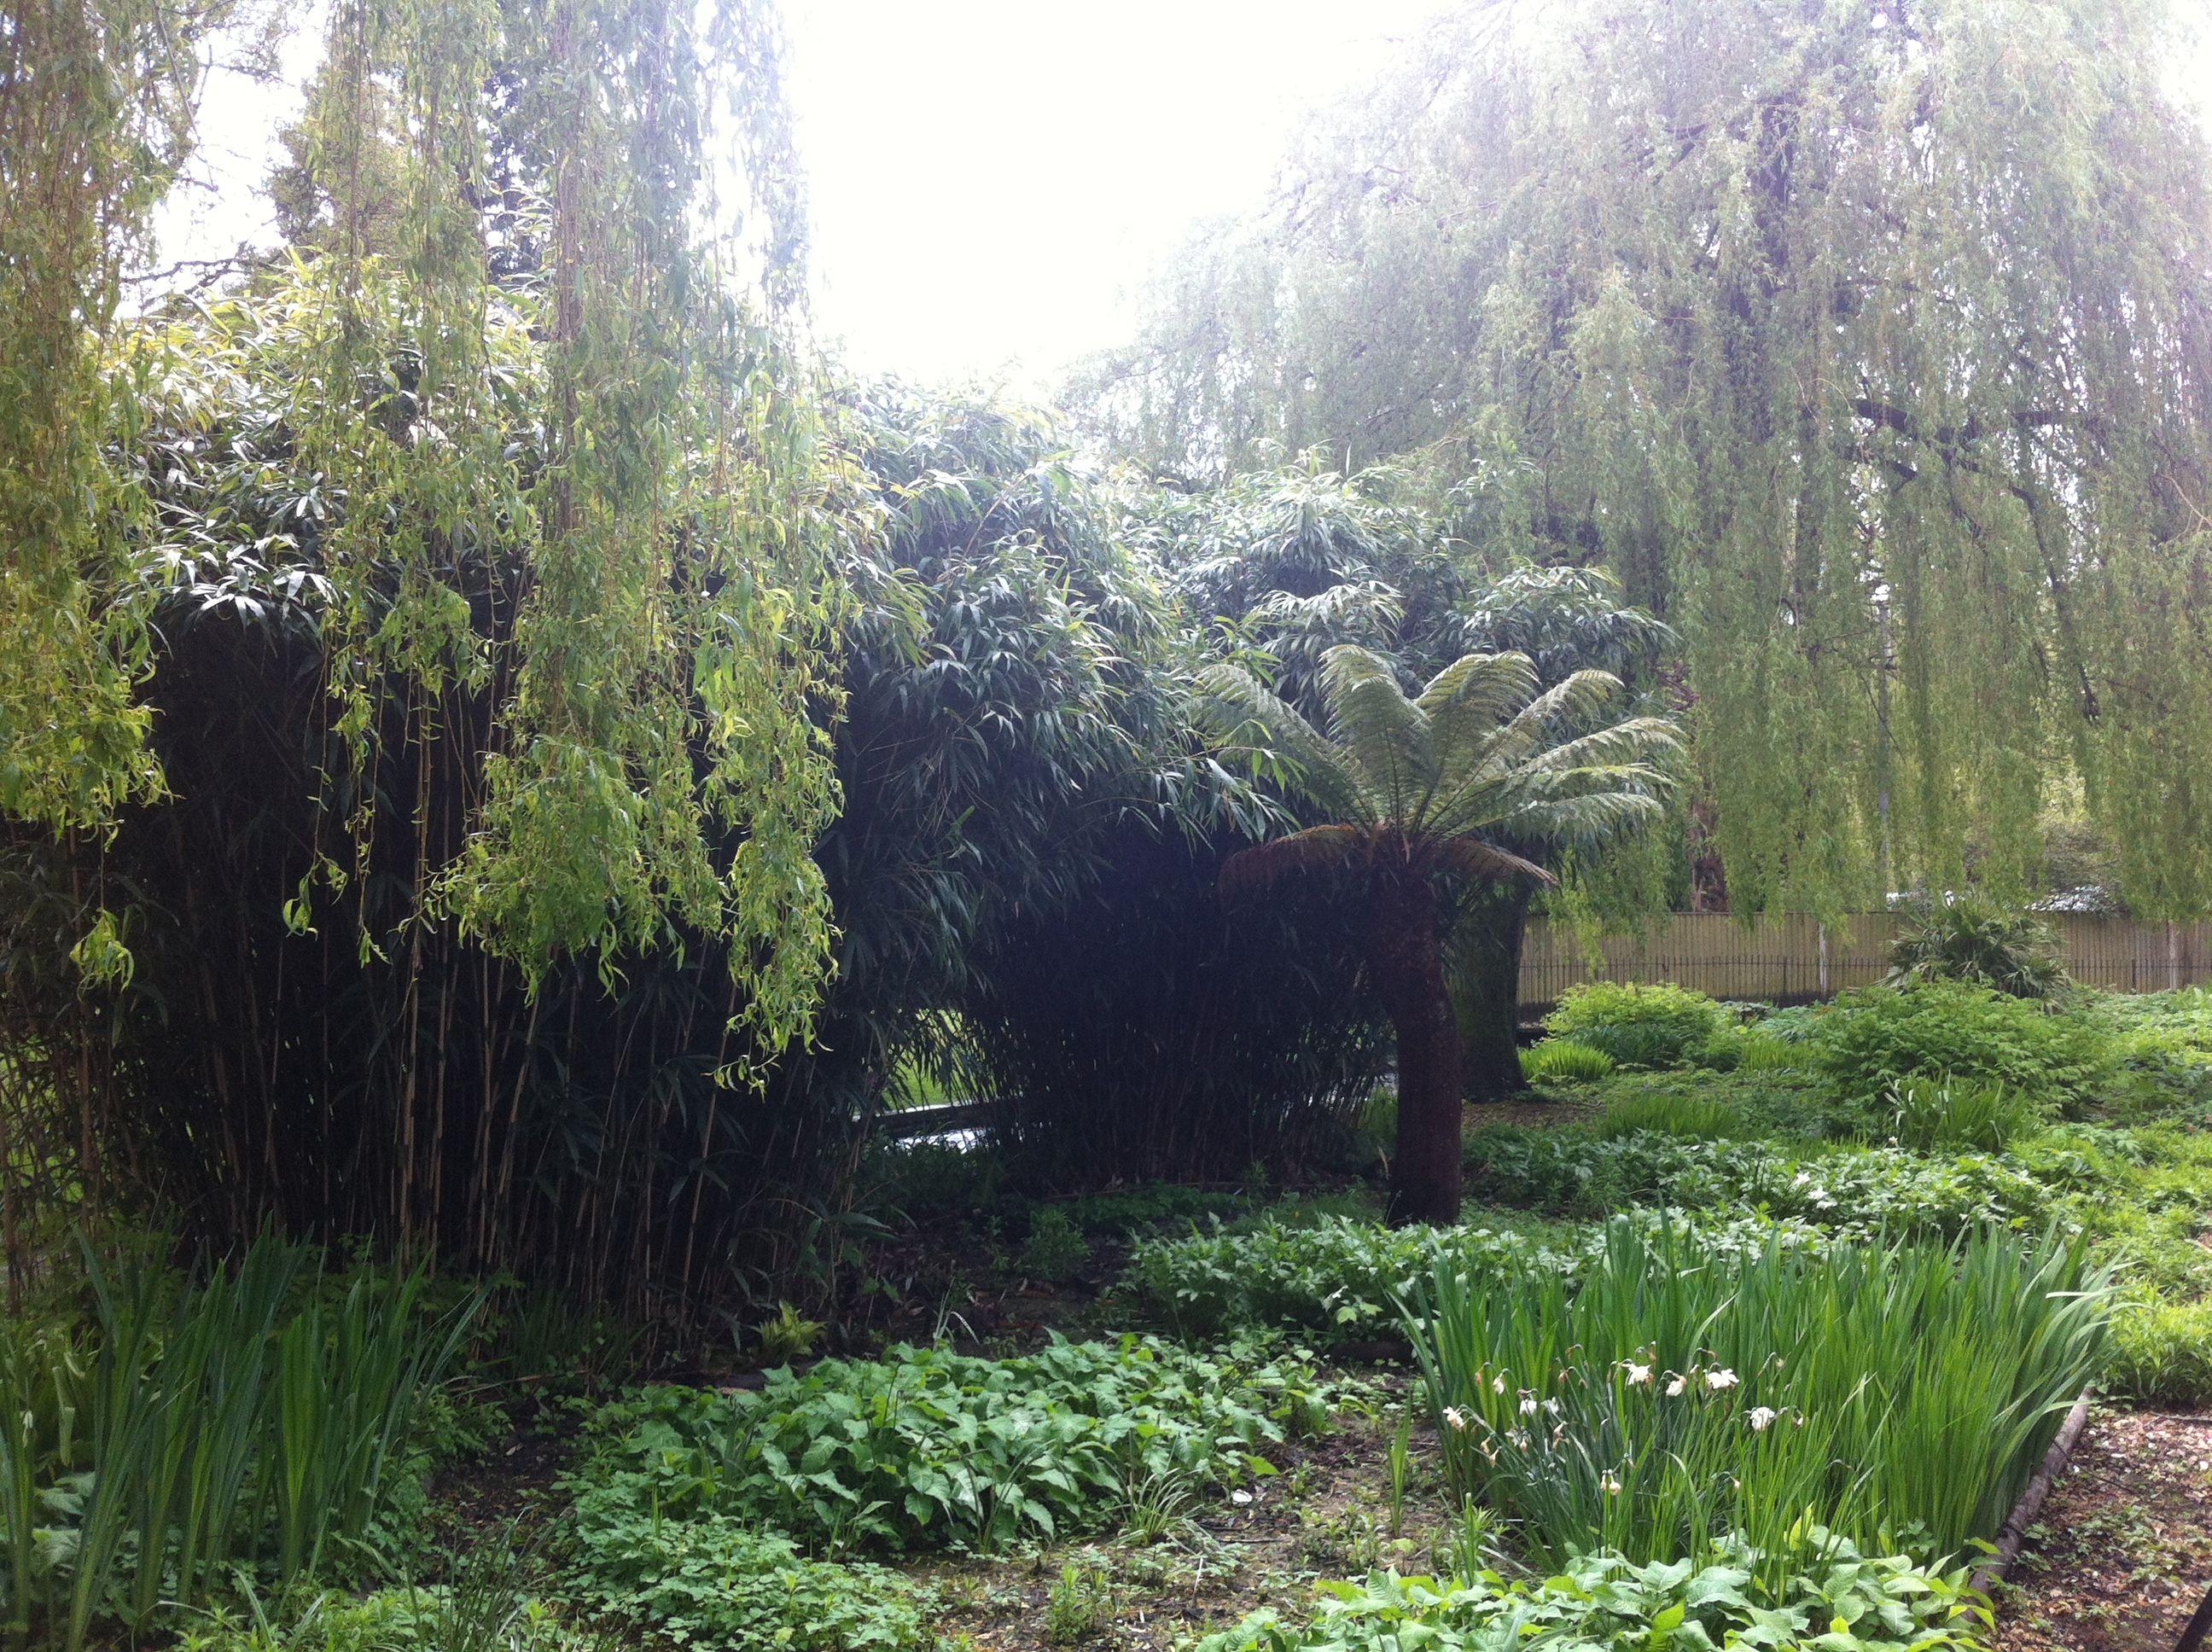 Garden landscape trees  Love willow trees  Garden Ideas  Pinterest  Willow tree Garden